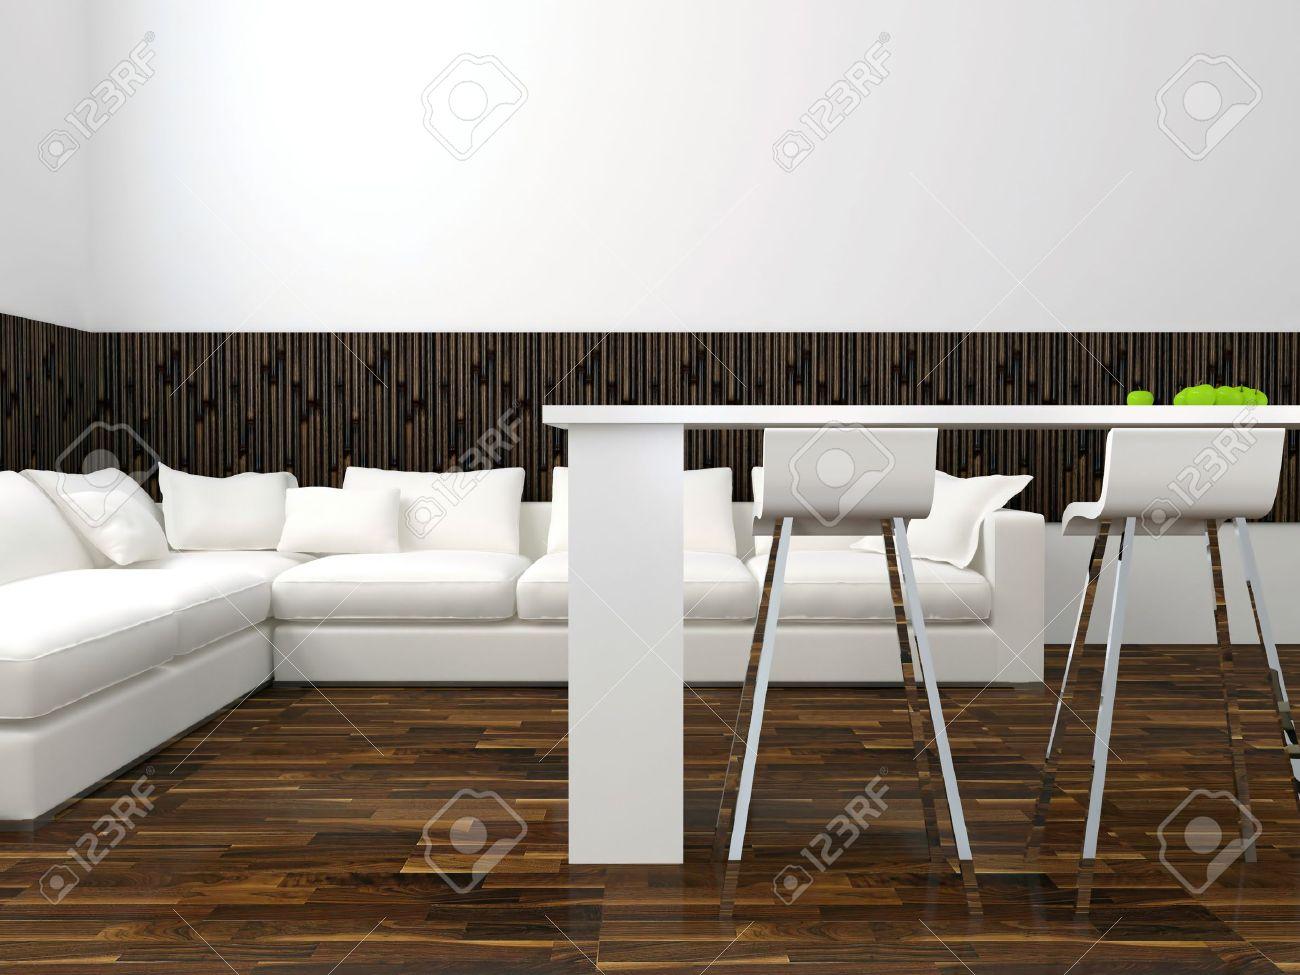 Interior Design Modern White Living Room With Big White Sofa